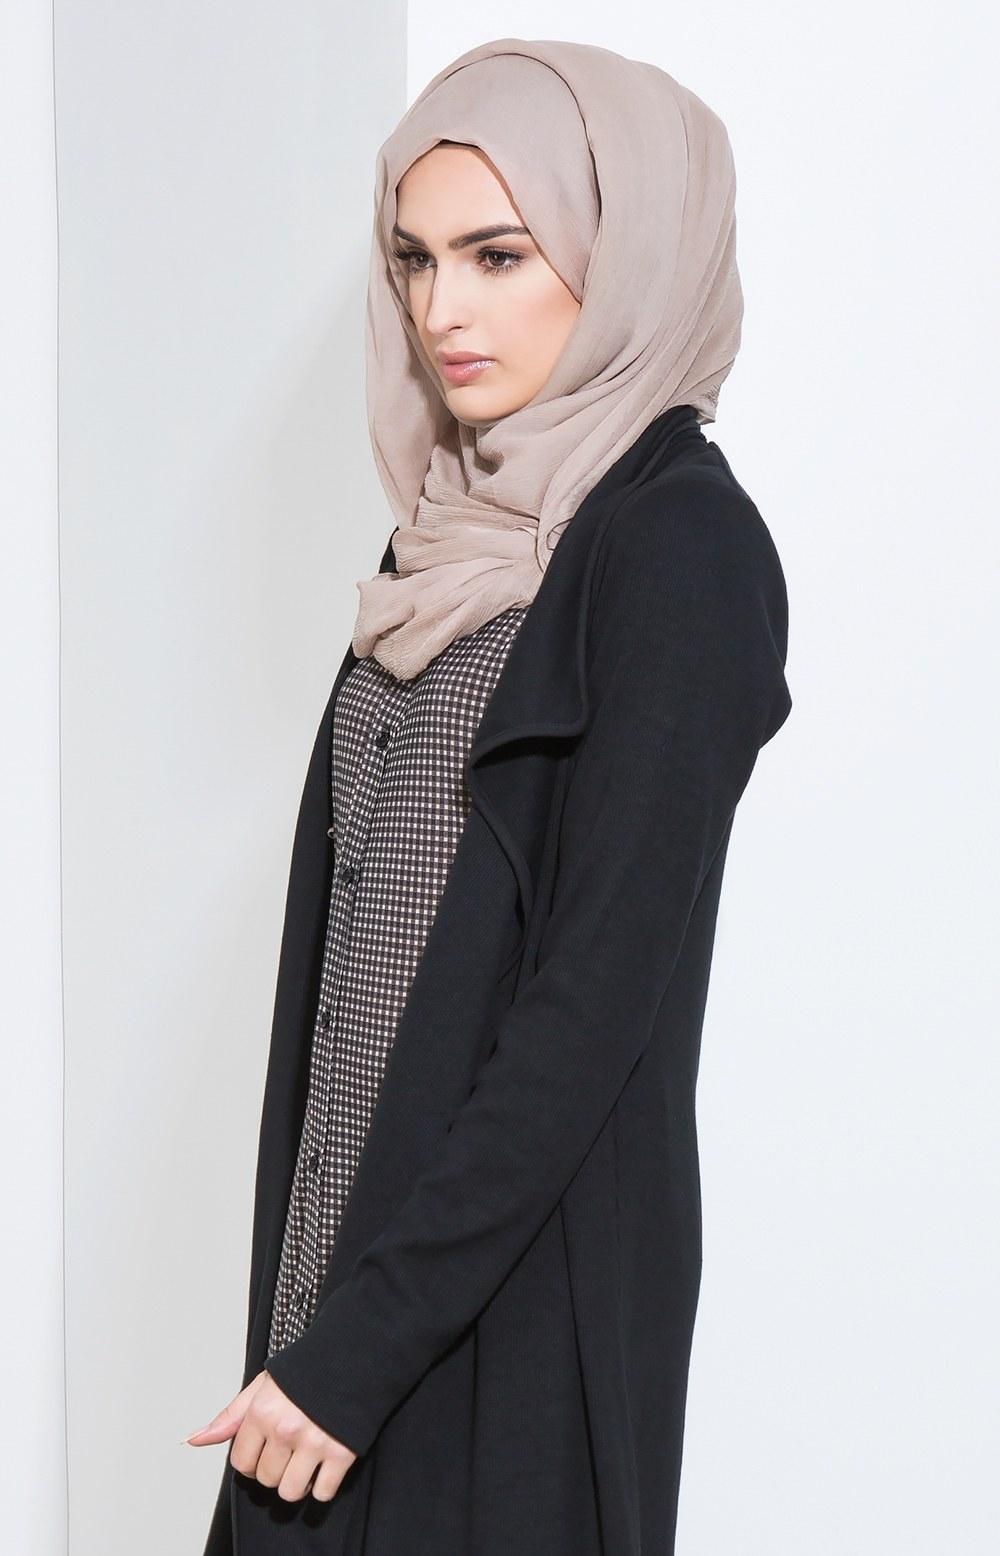 Inspirasi Model Baju Lebaran Dian Pelangi 2017 8ydm 25 Trend Model Baju Muslim Lebaran 2018 Simple & Modis